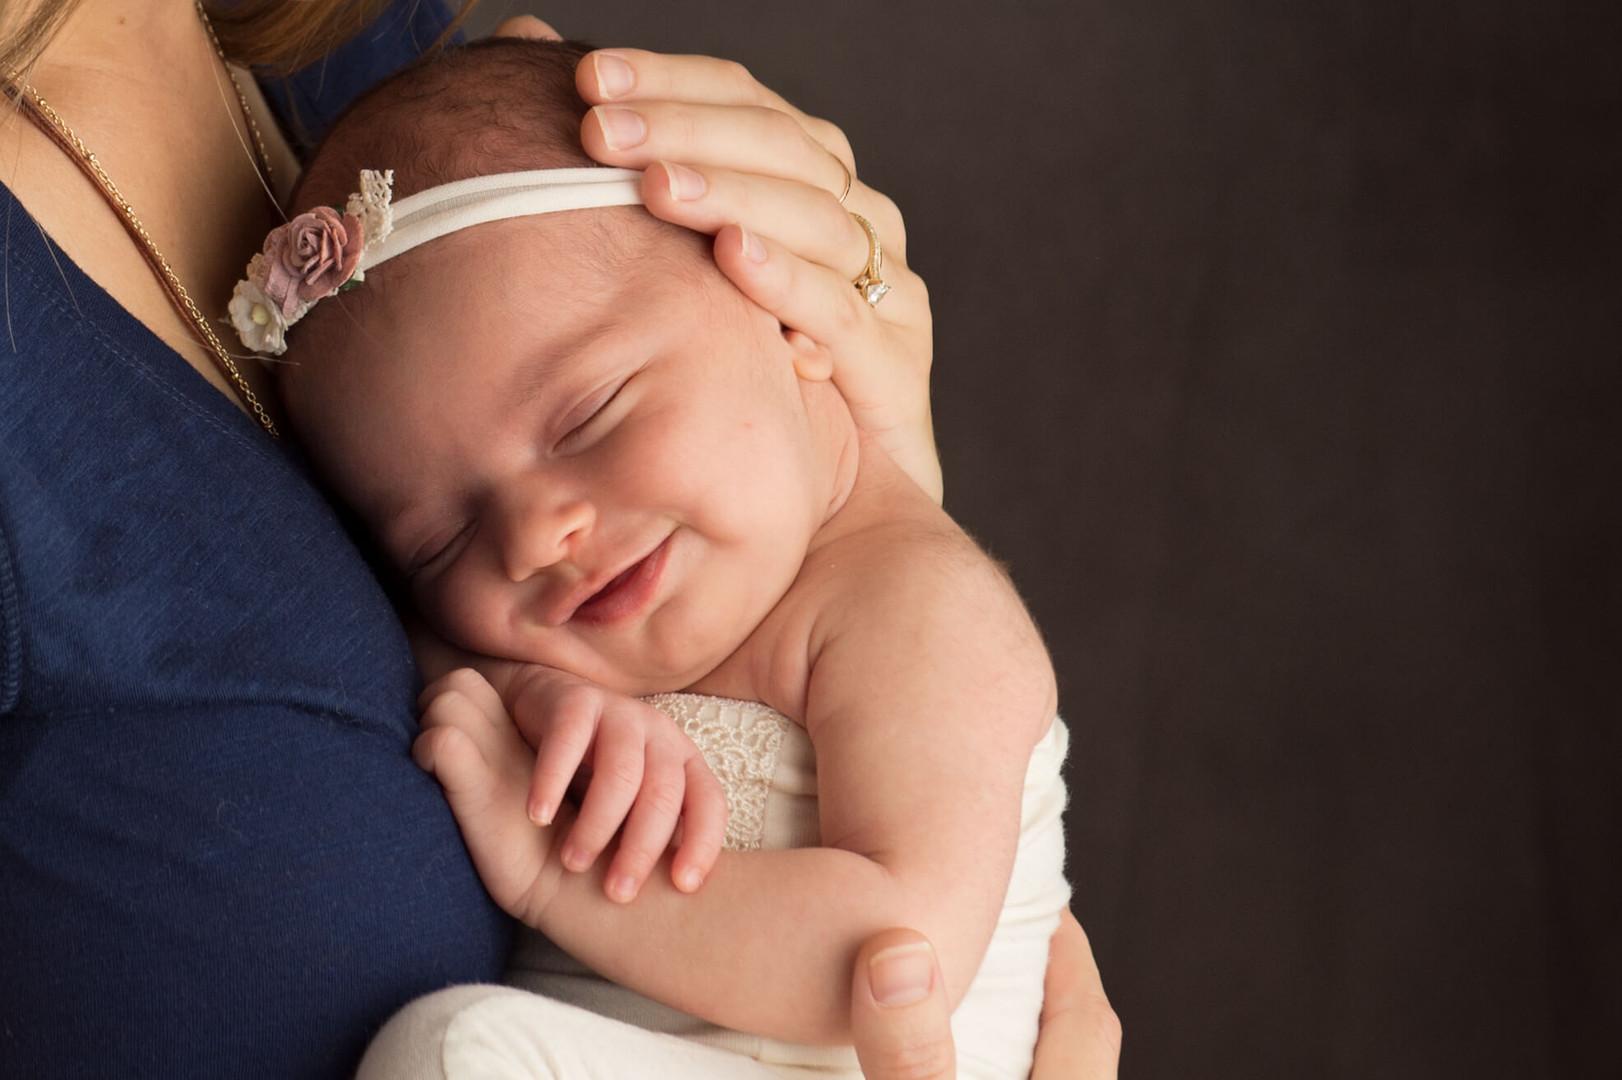 snuggled against mom